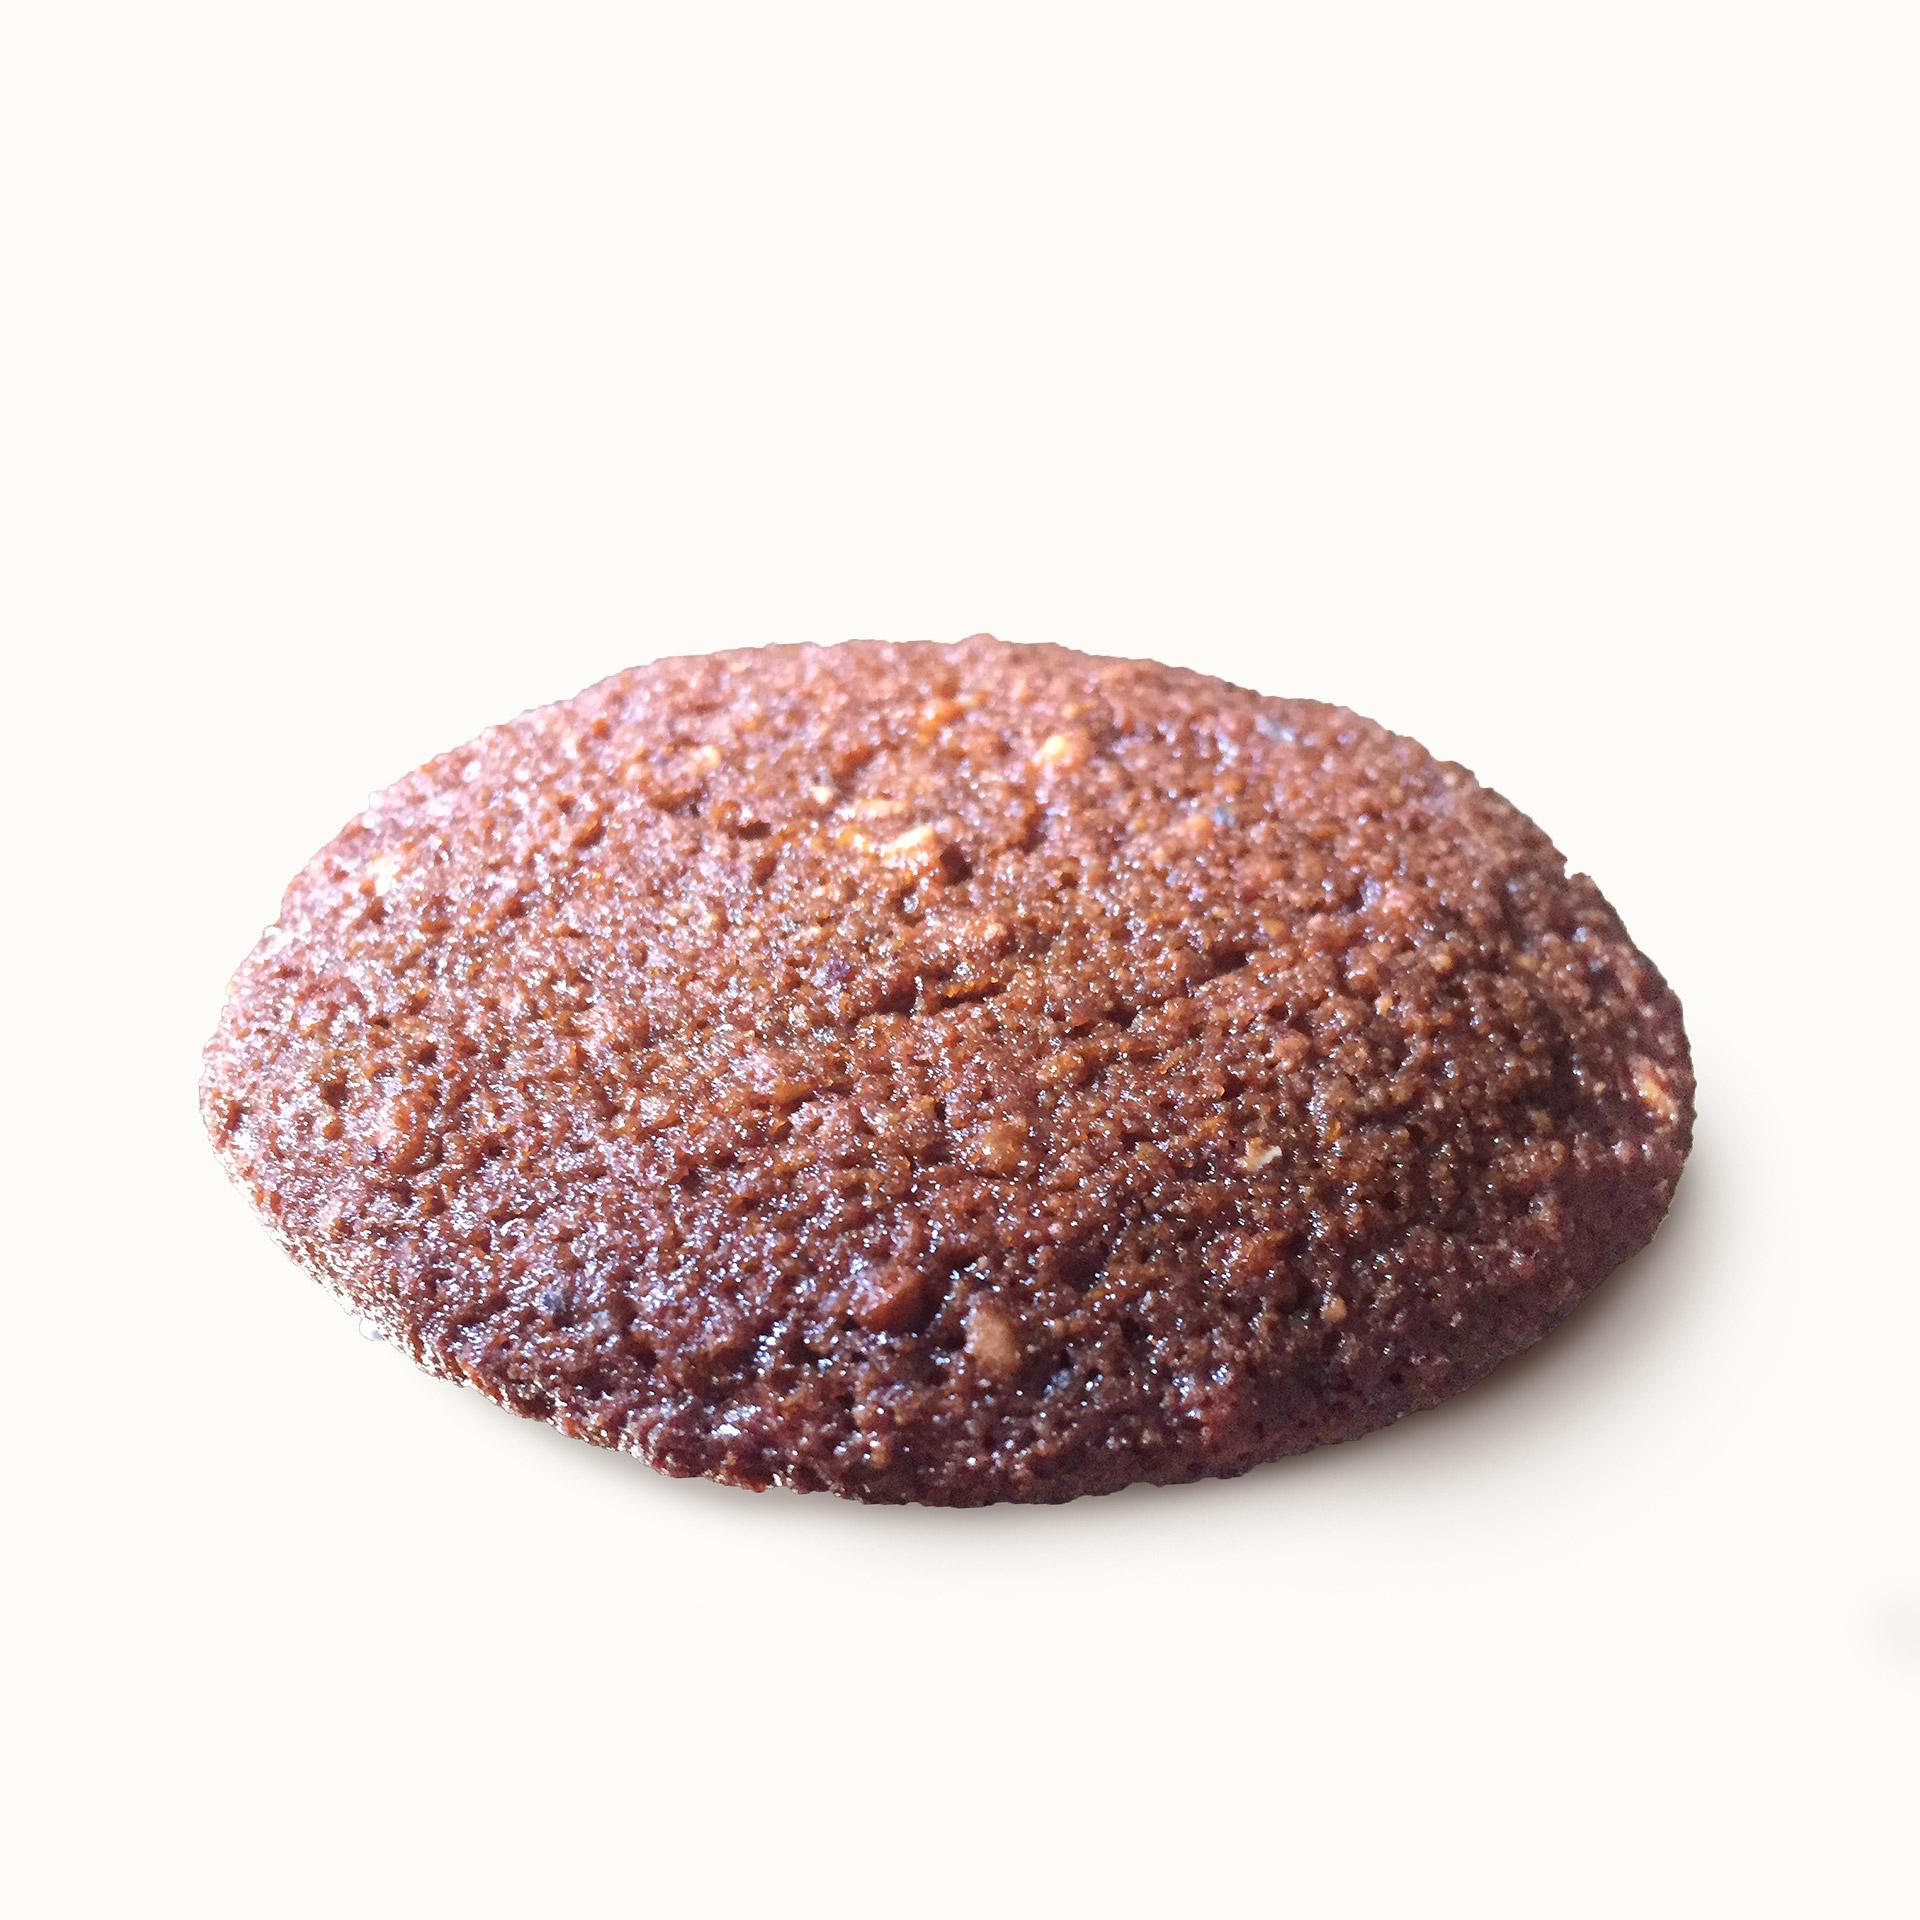 Elisenlebkuchen ohne Schokolade (5 Stk.)